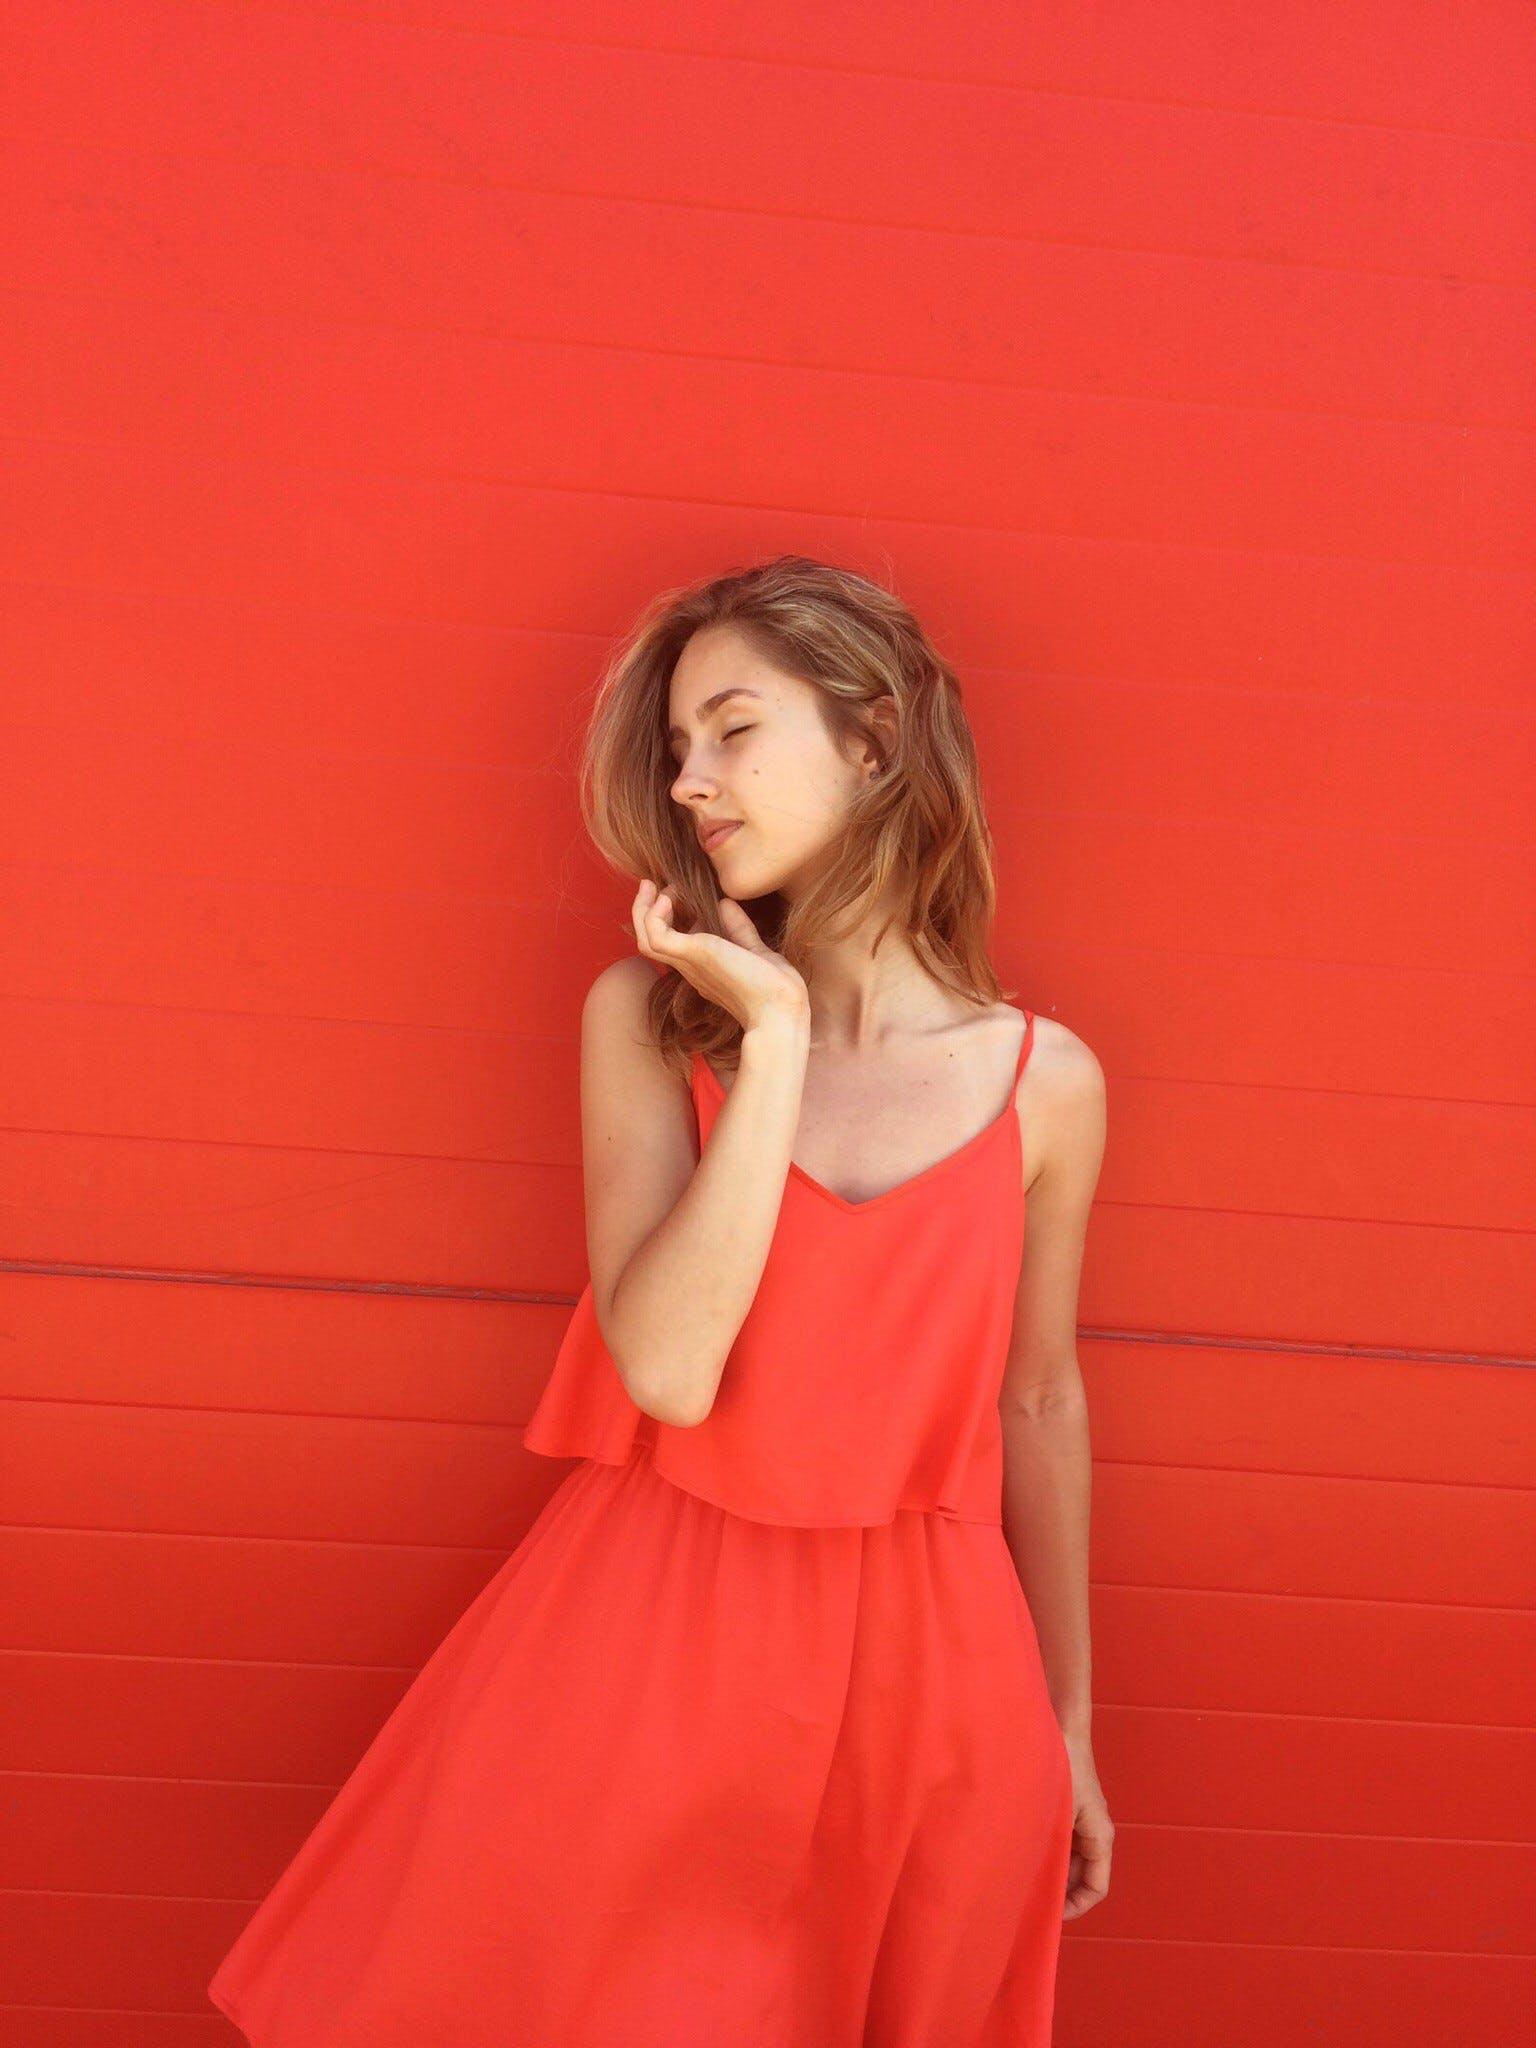 Woman Wearing Orange Spaghetti-strap Dress